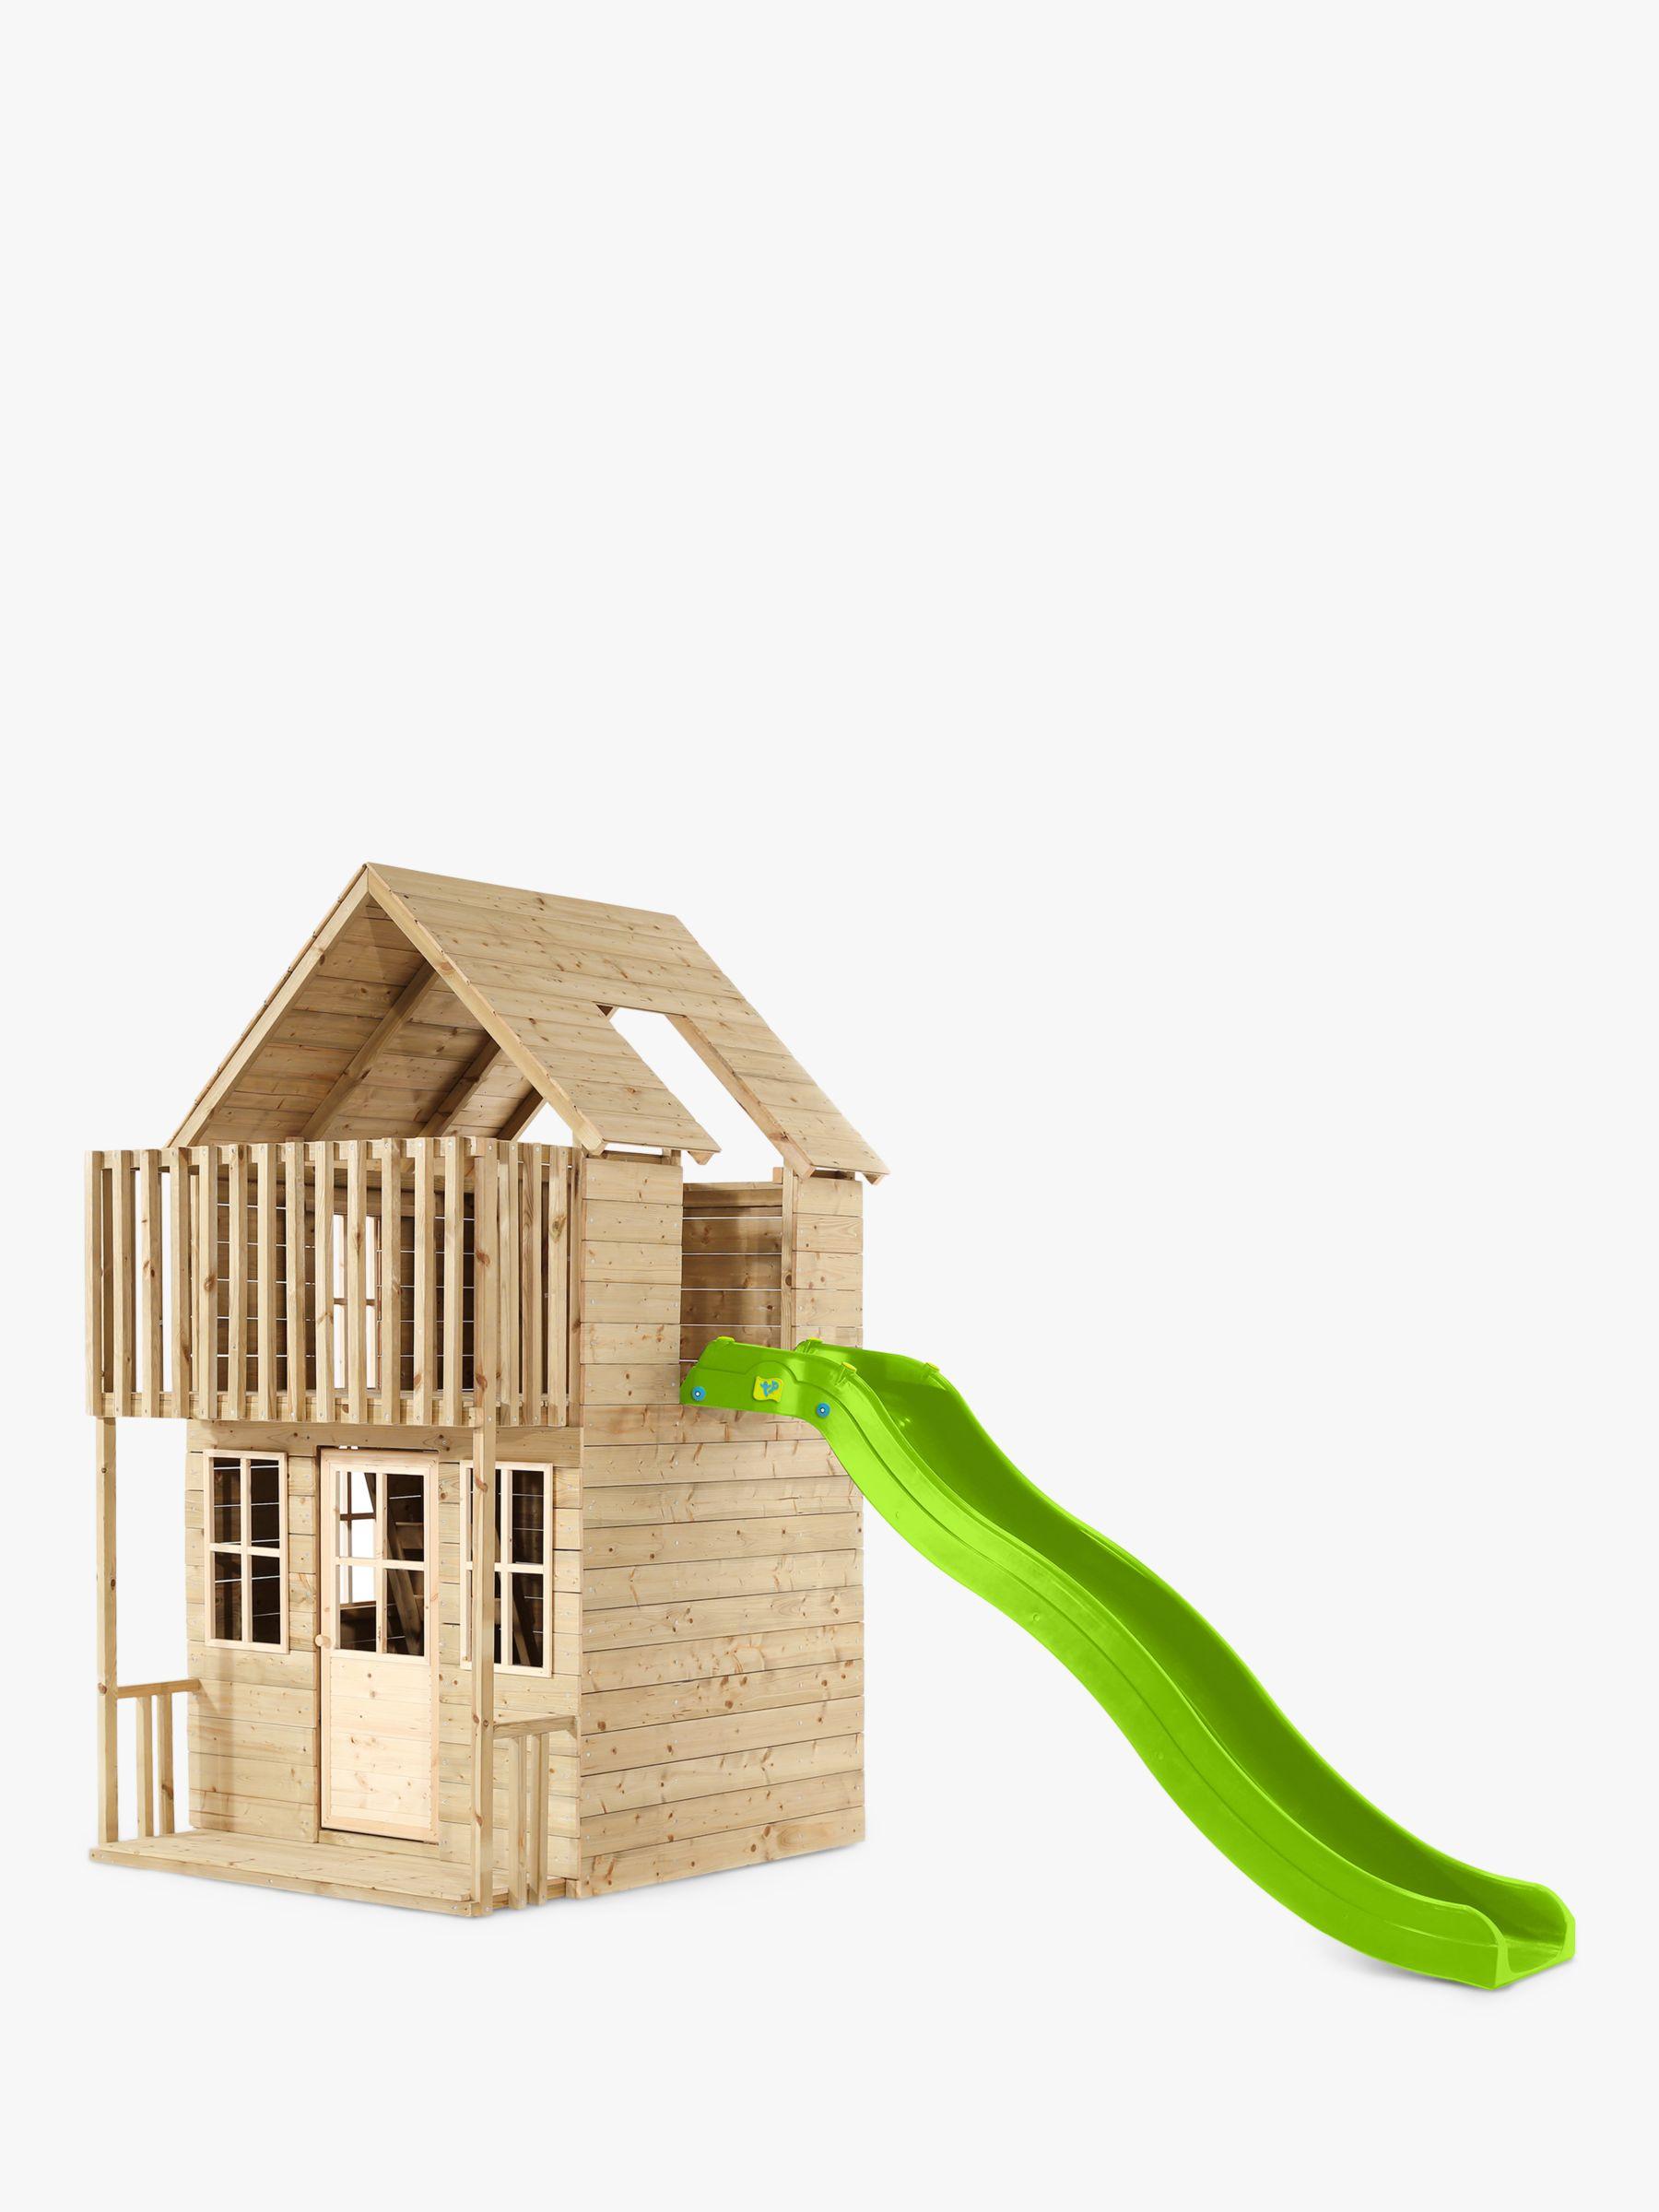 TP Toys TP Toys Salcombe Playhouse & Slide